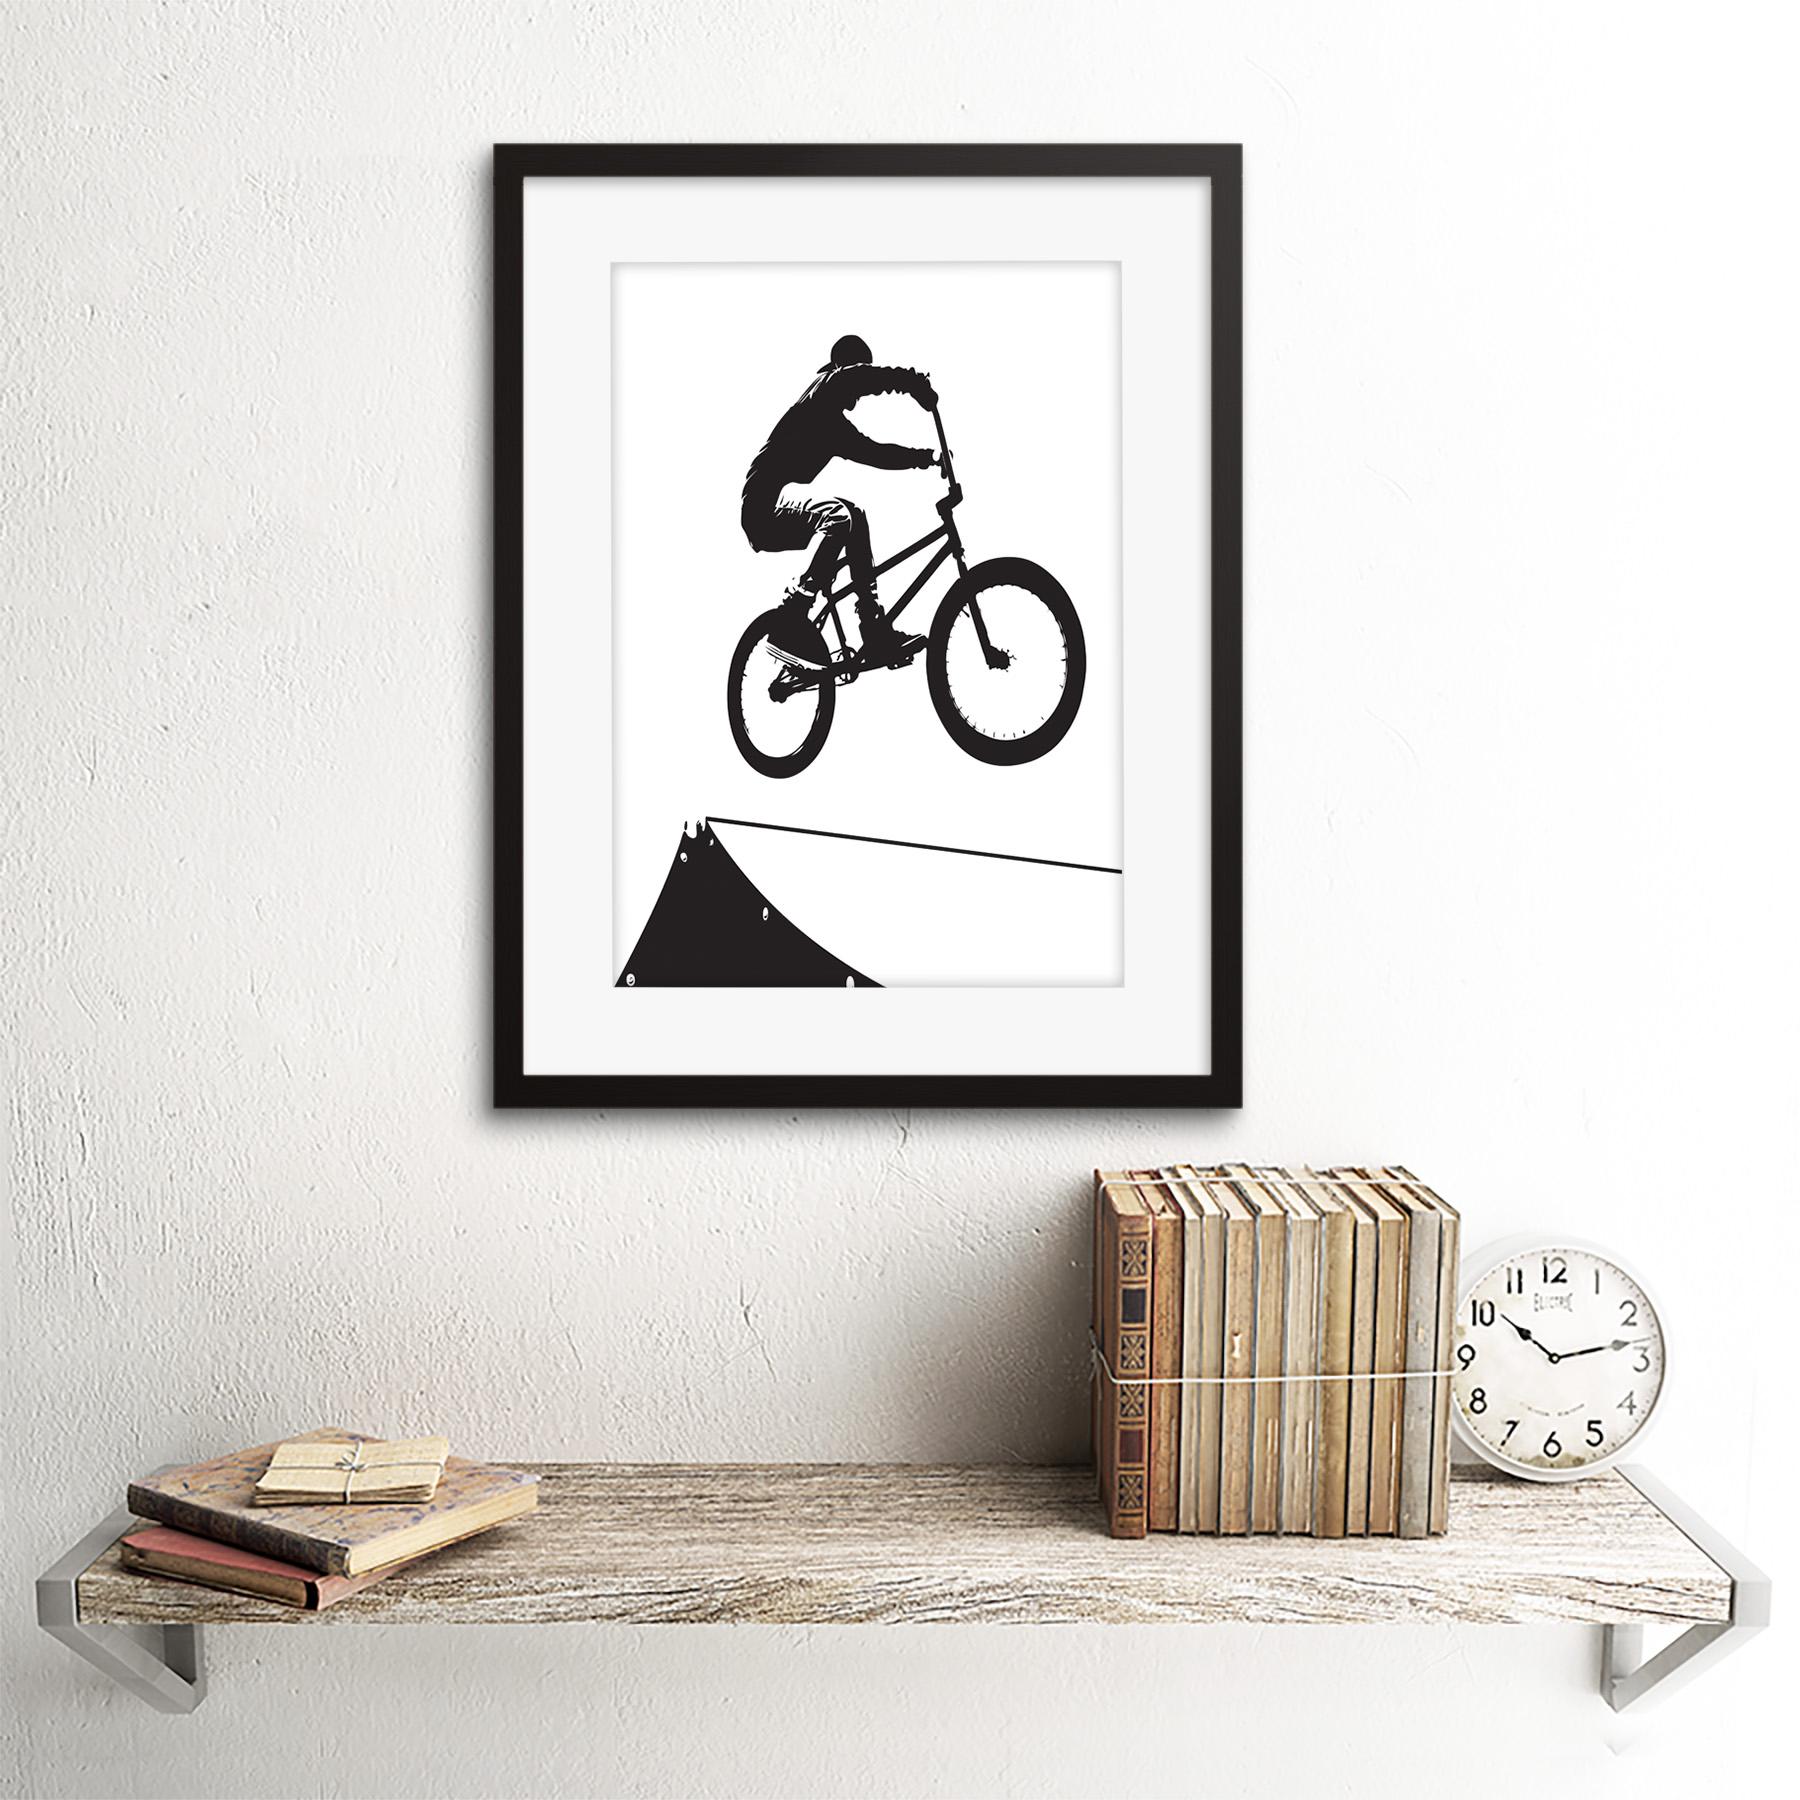 "Indexbild 3 - Painting Sport Bmx Bike Bicycle Jump Air Ramp Black White Framed Print 12x16"""